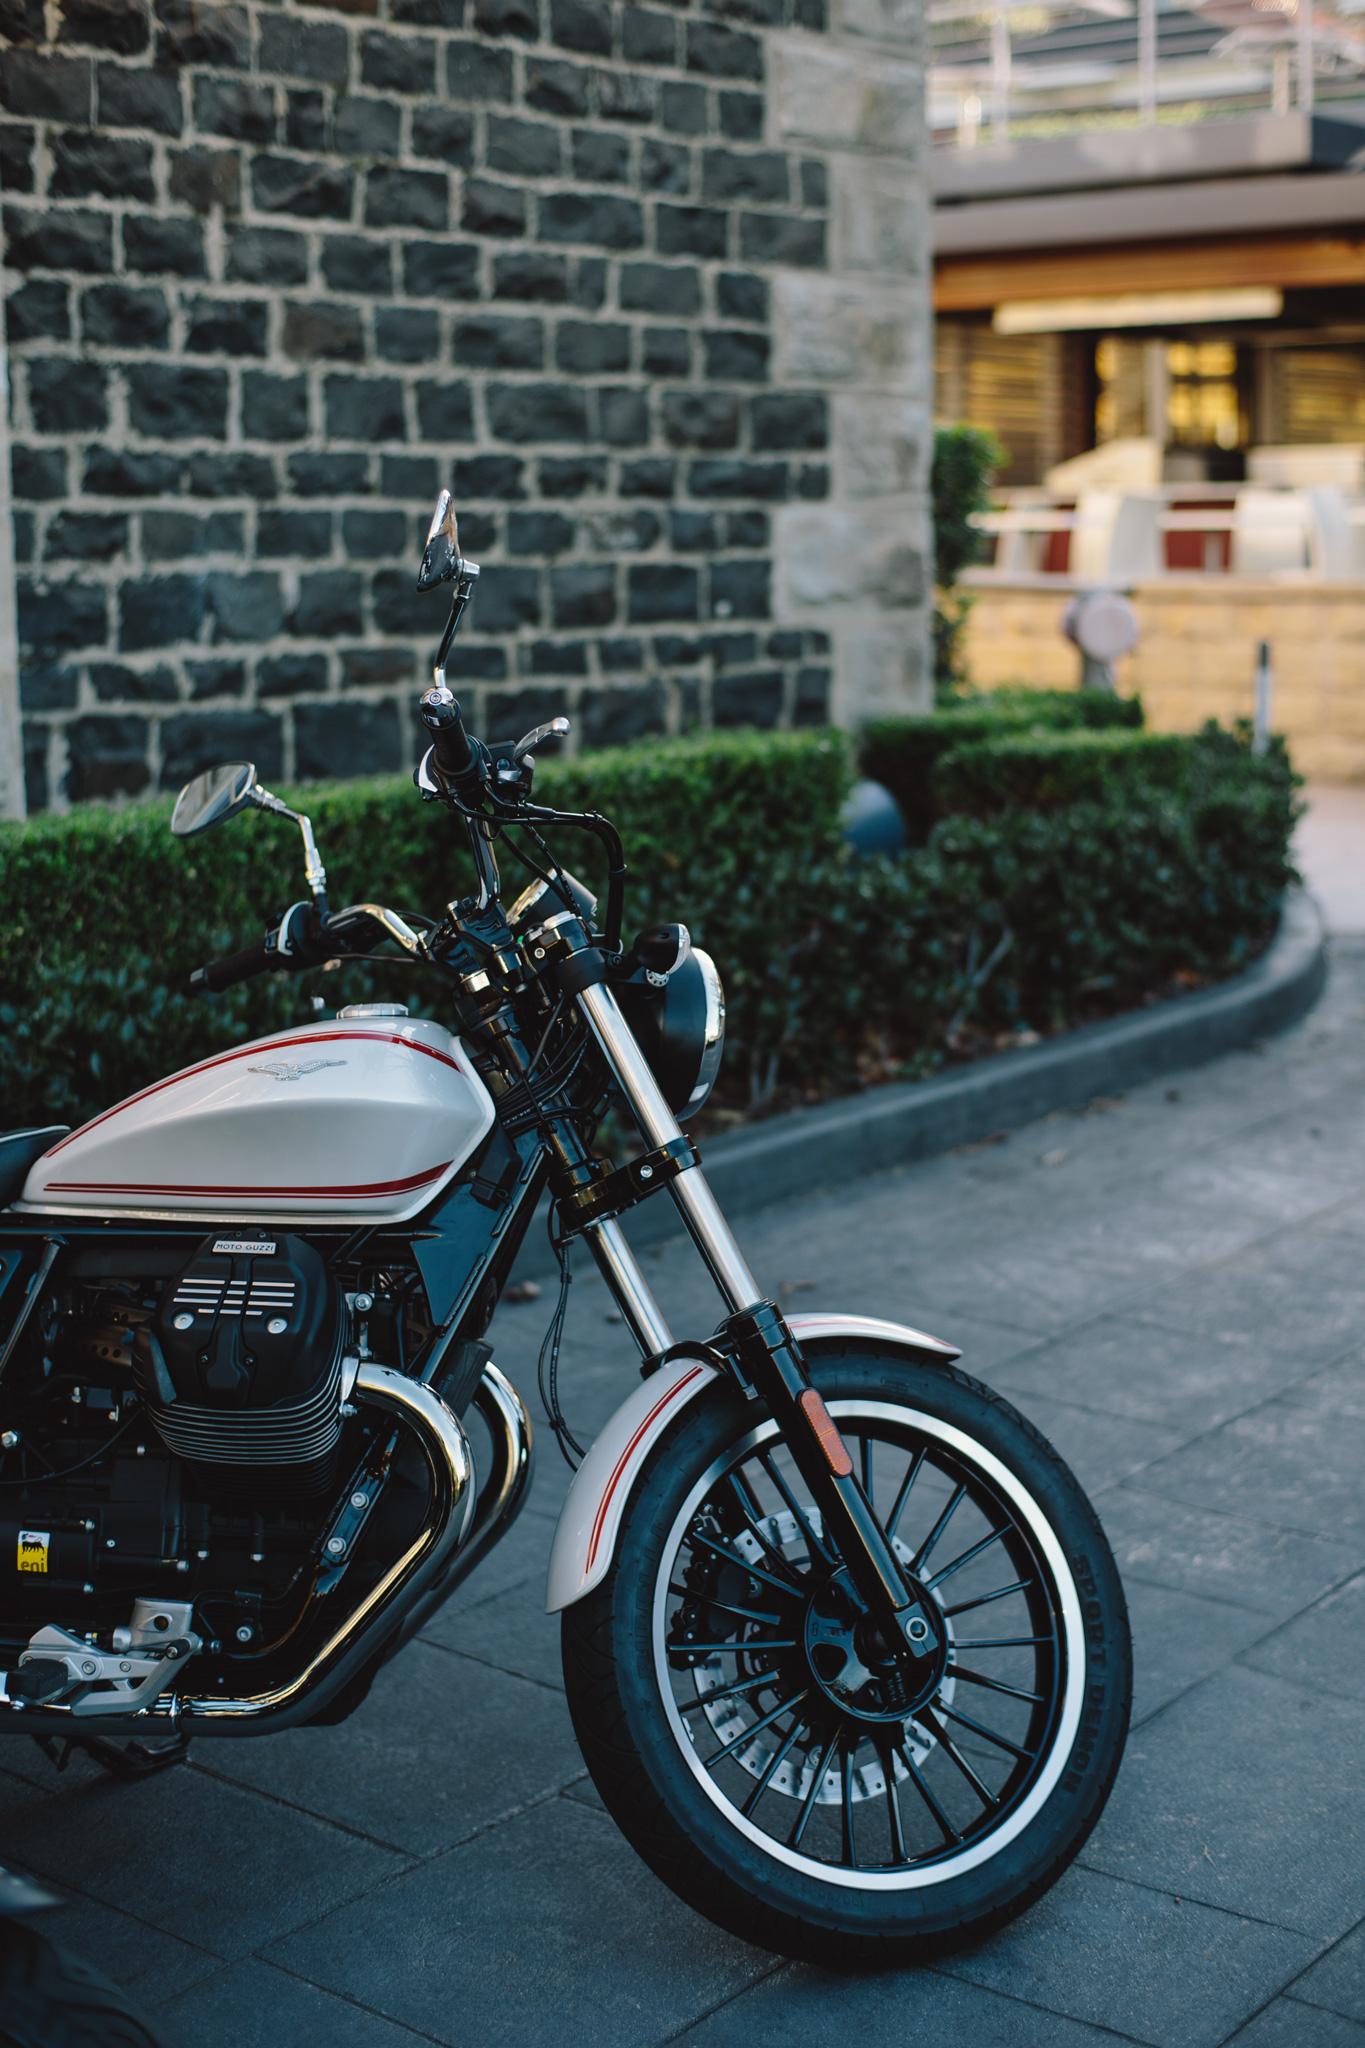 Moto-Guzzi_V9_Roamer_Bobber20160609 (2)